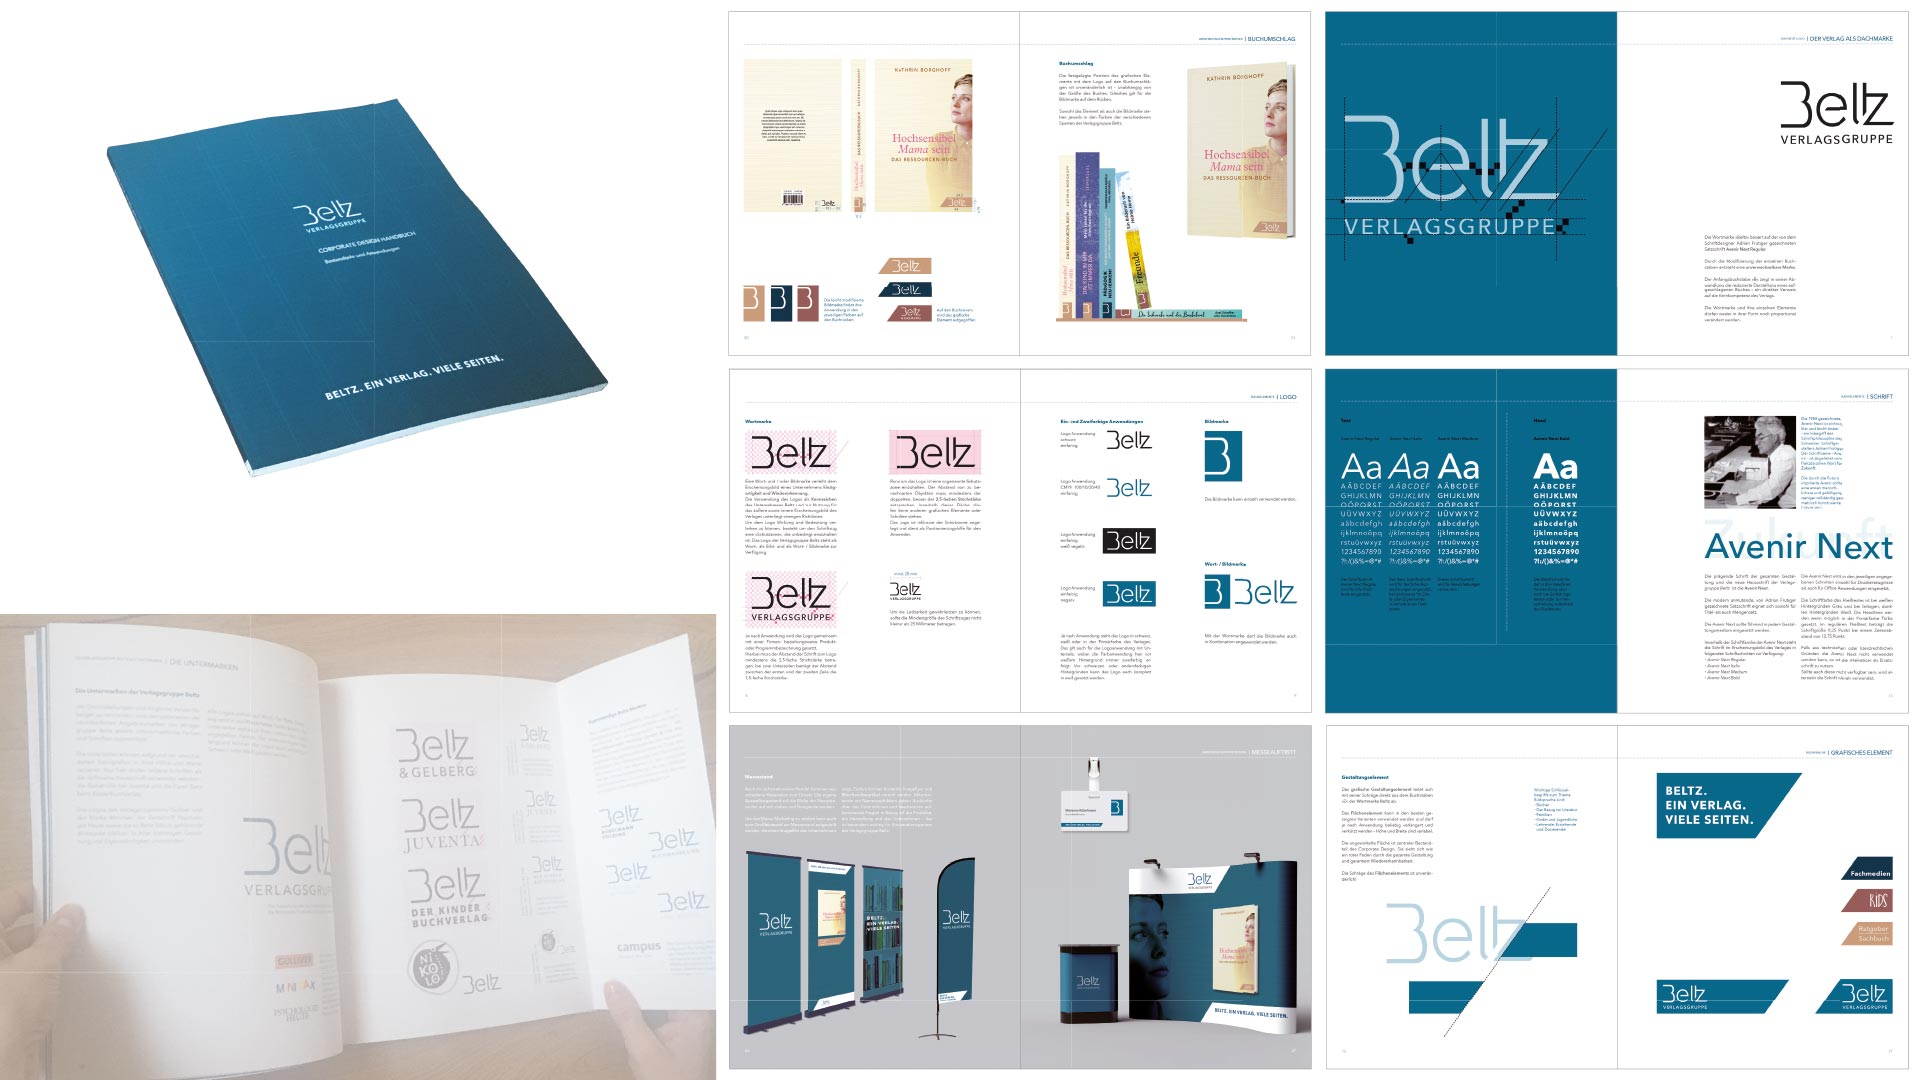 Übersicht Corporate Design Handbuch Verlagsgruppe Beltz